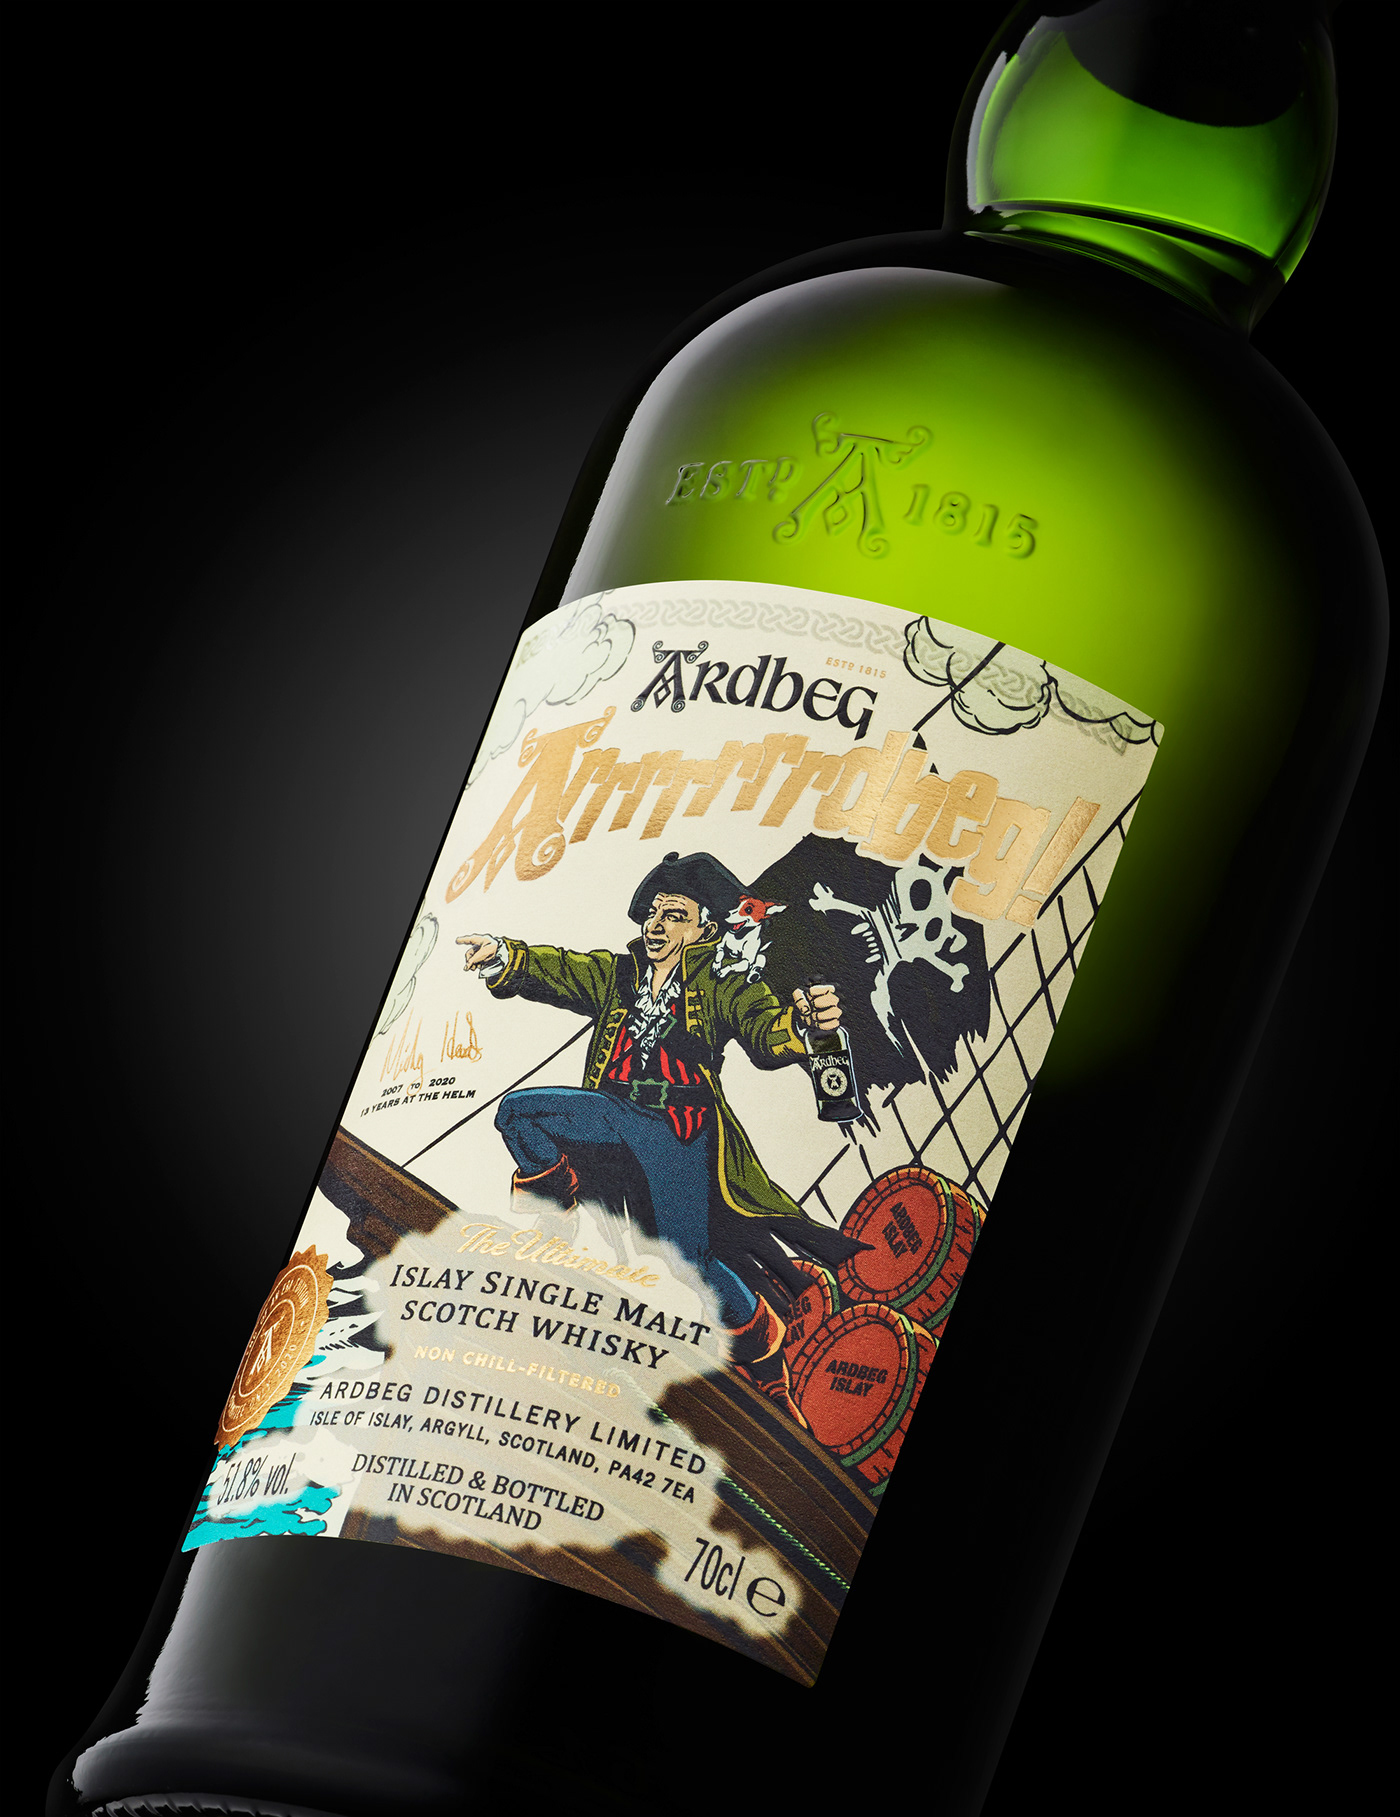 Ardbeg edinburgh limited edition pirates scotch Whisky